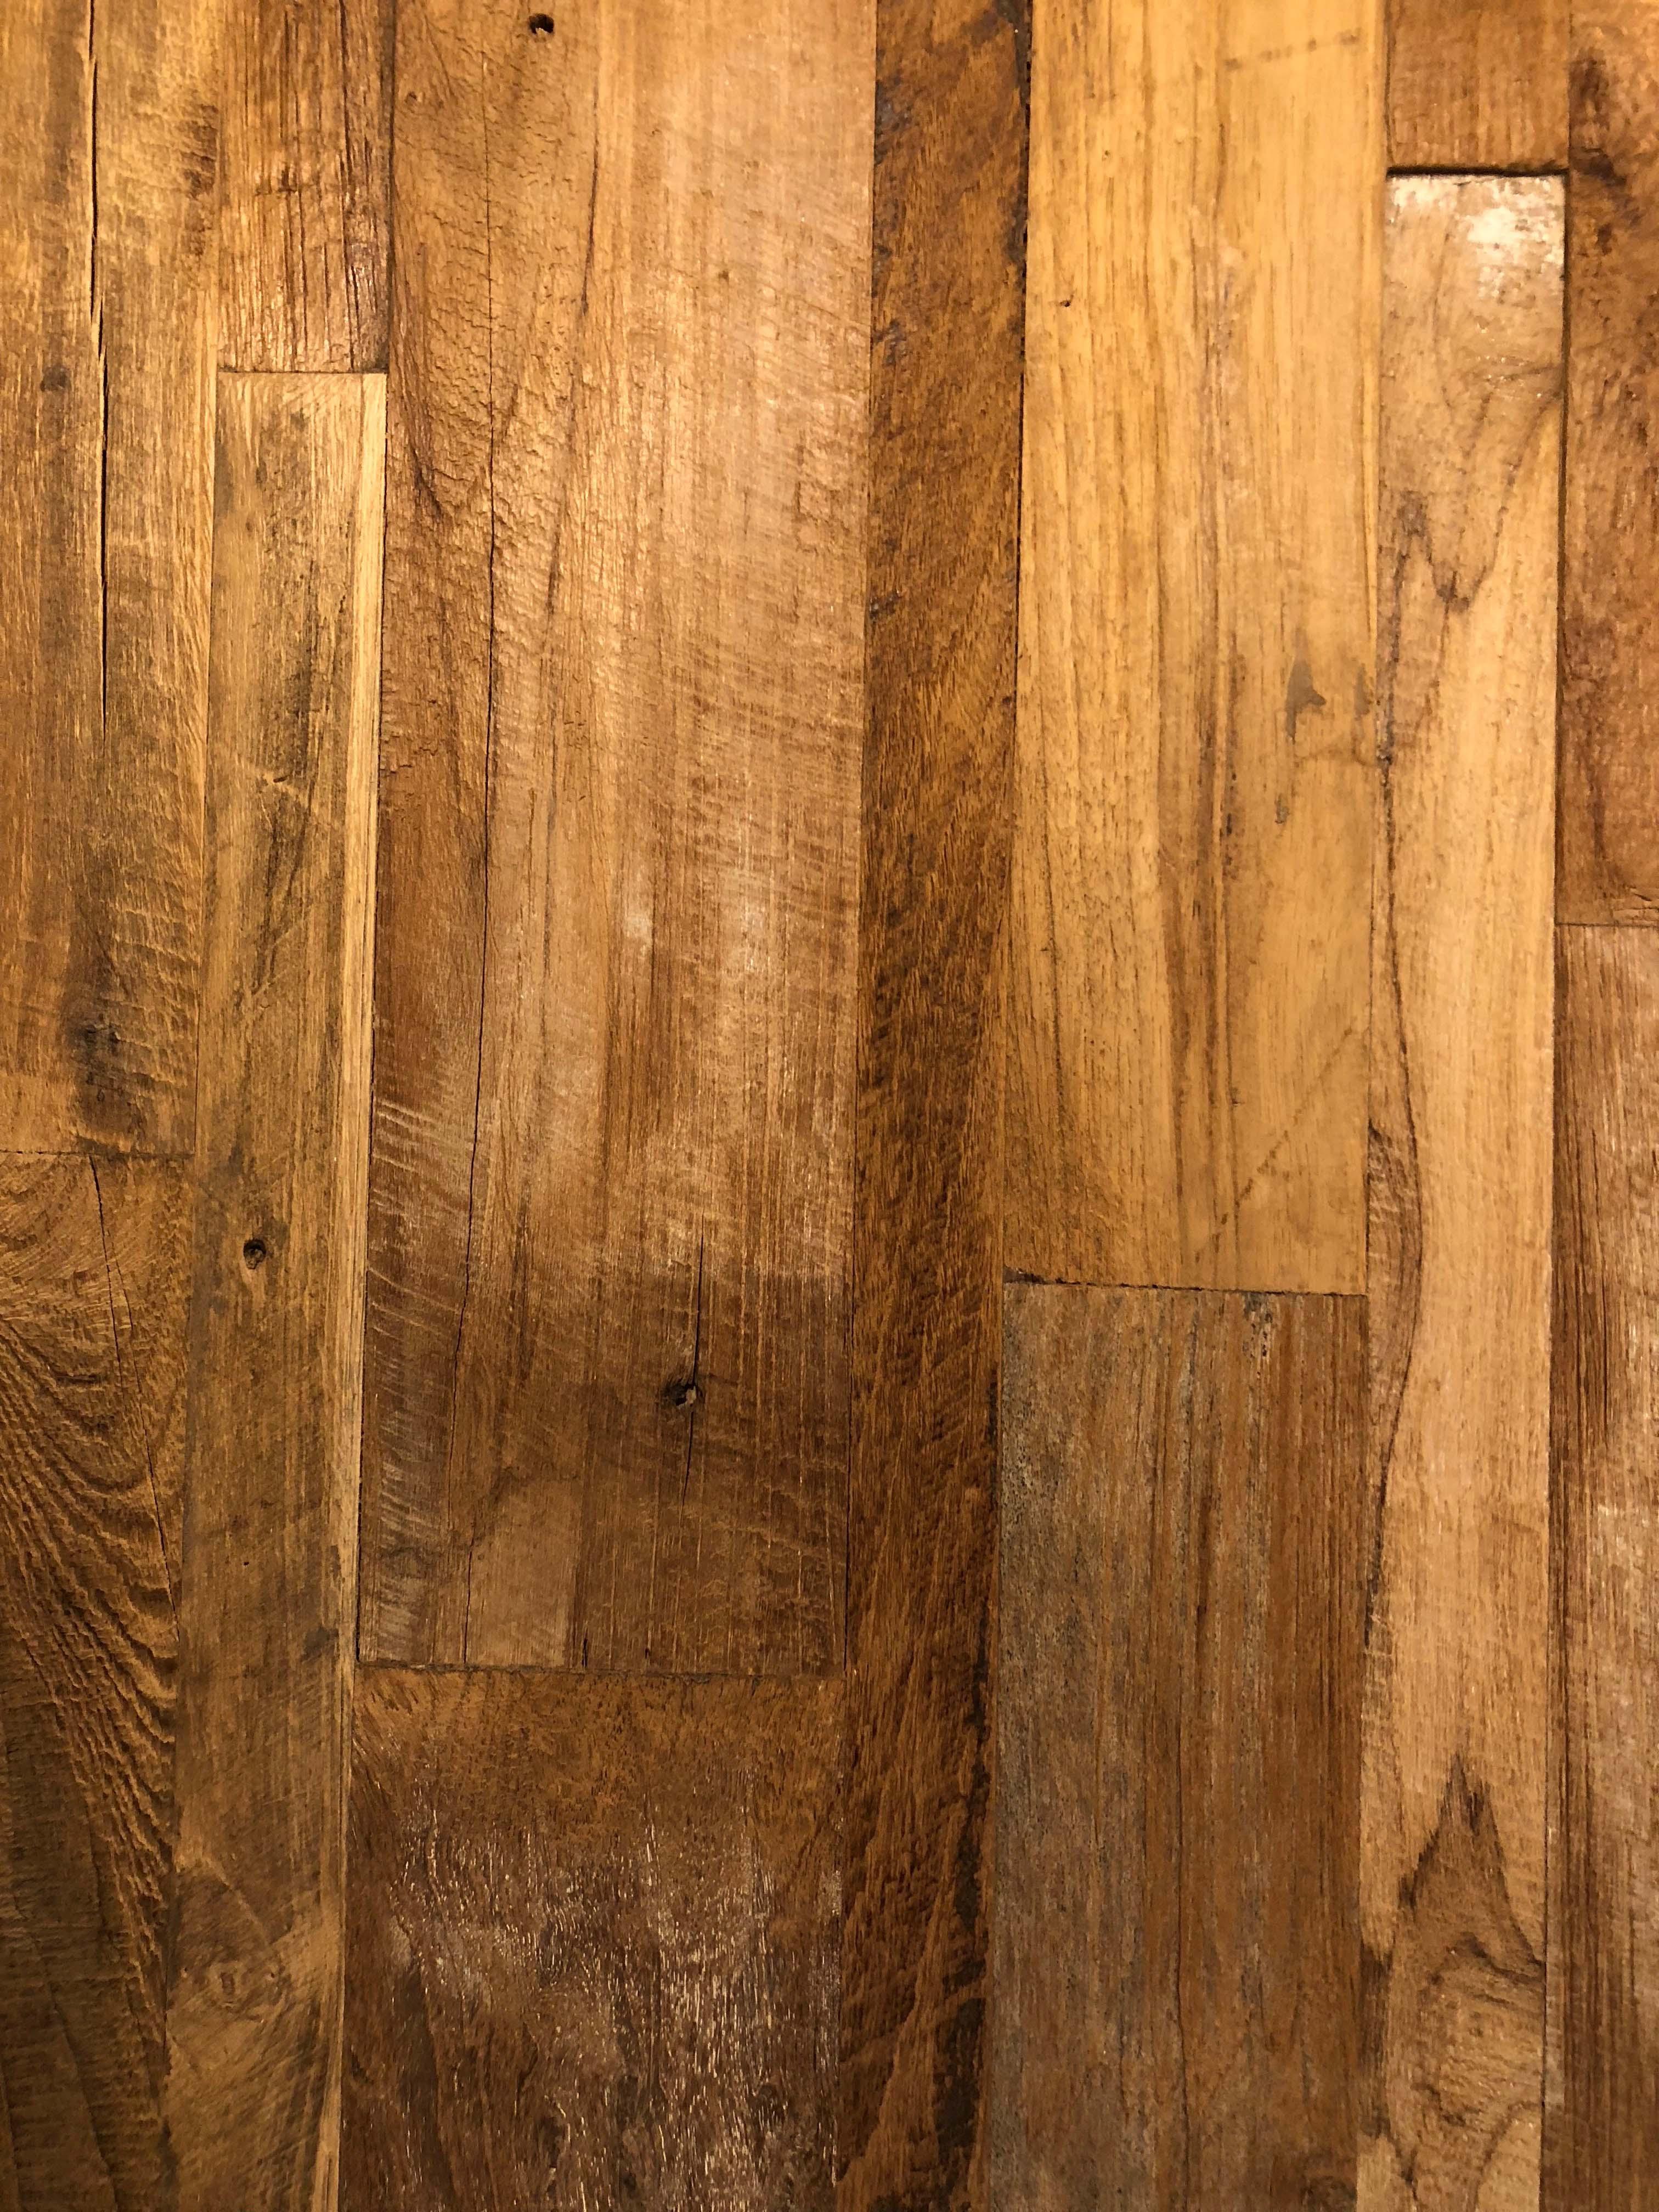 patina plywood - Reclaimed Teak Plywood Panels